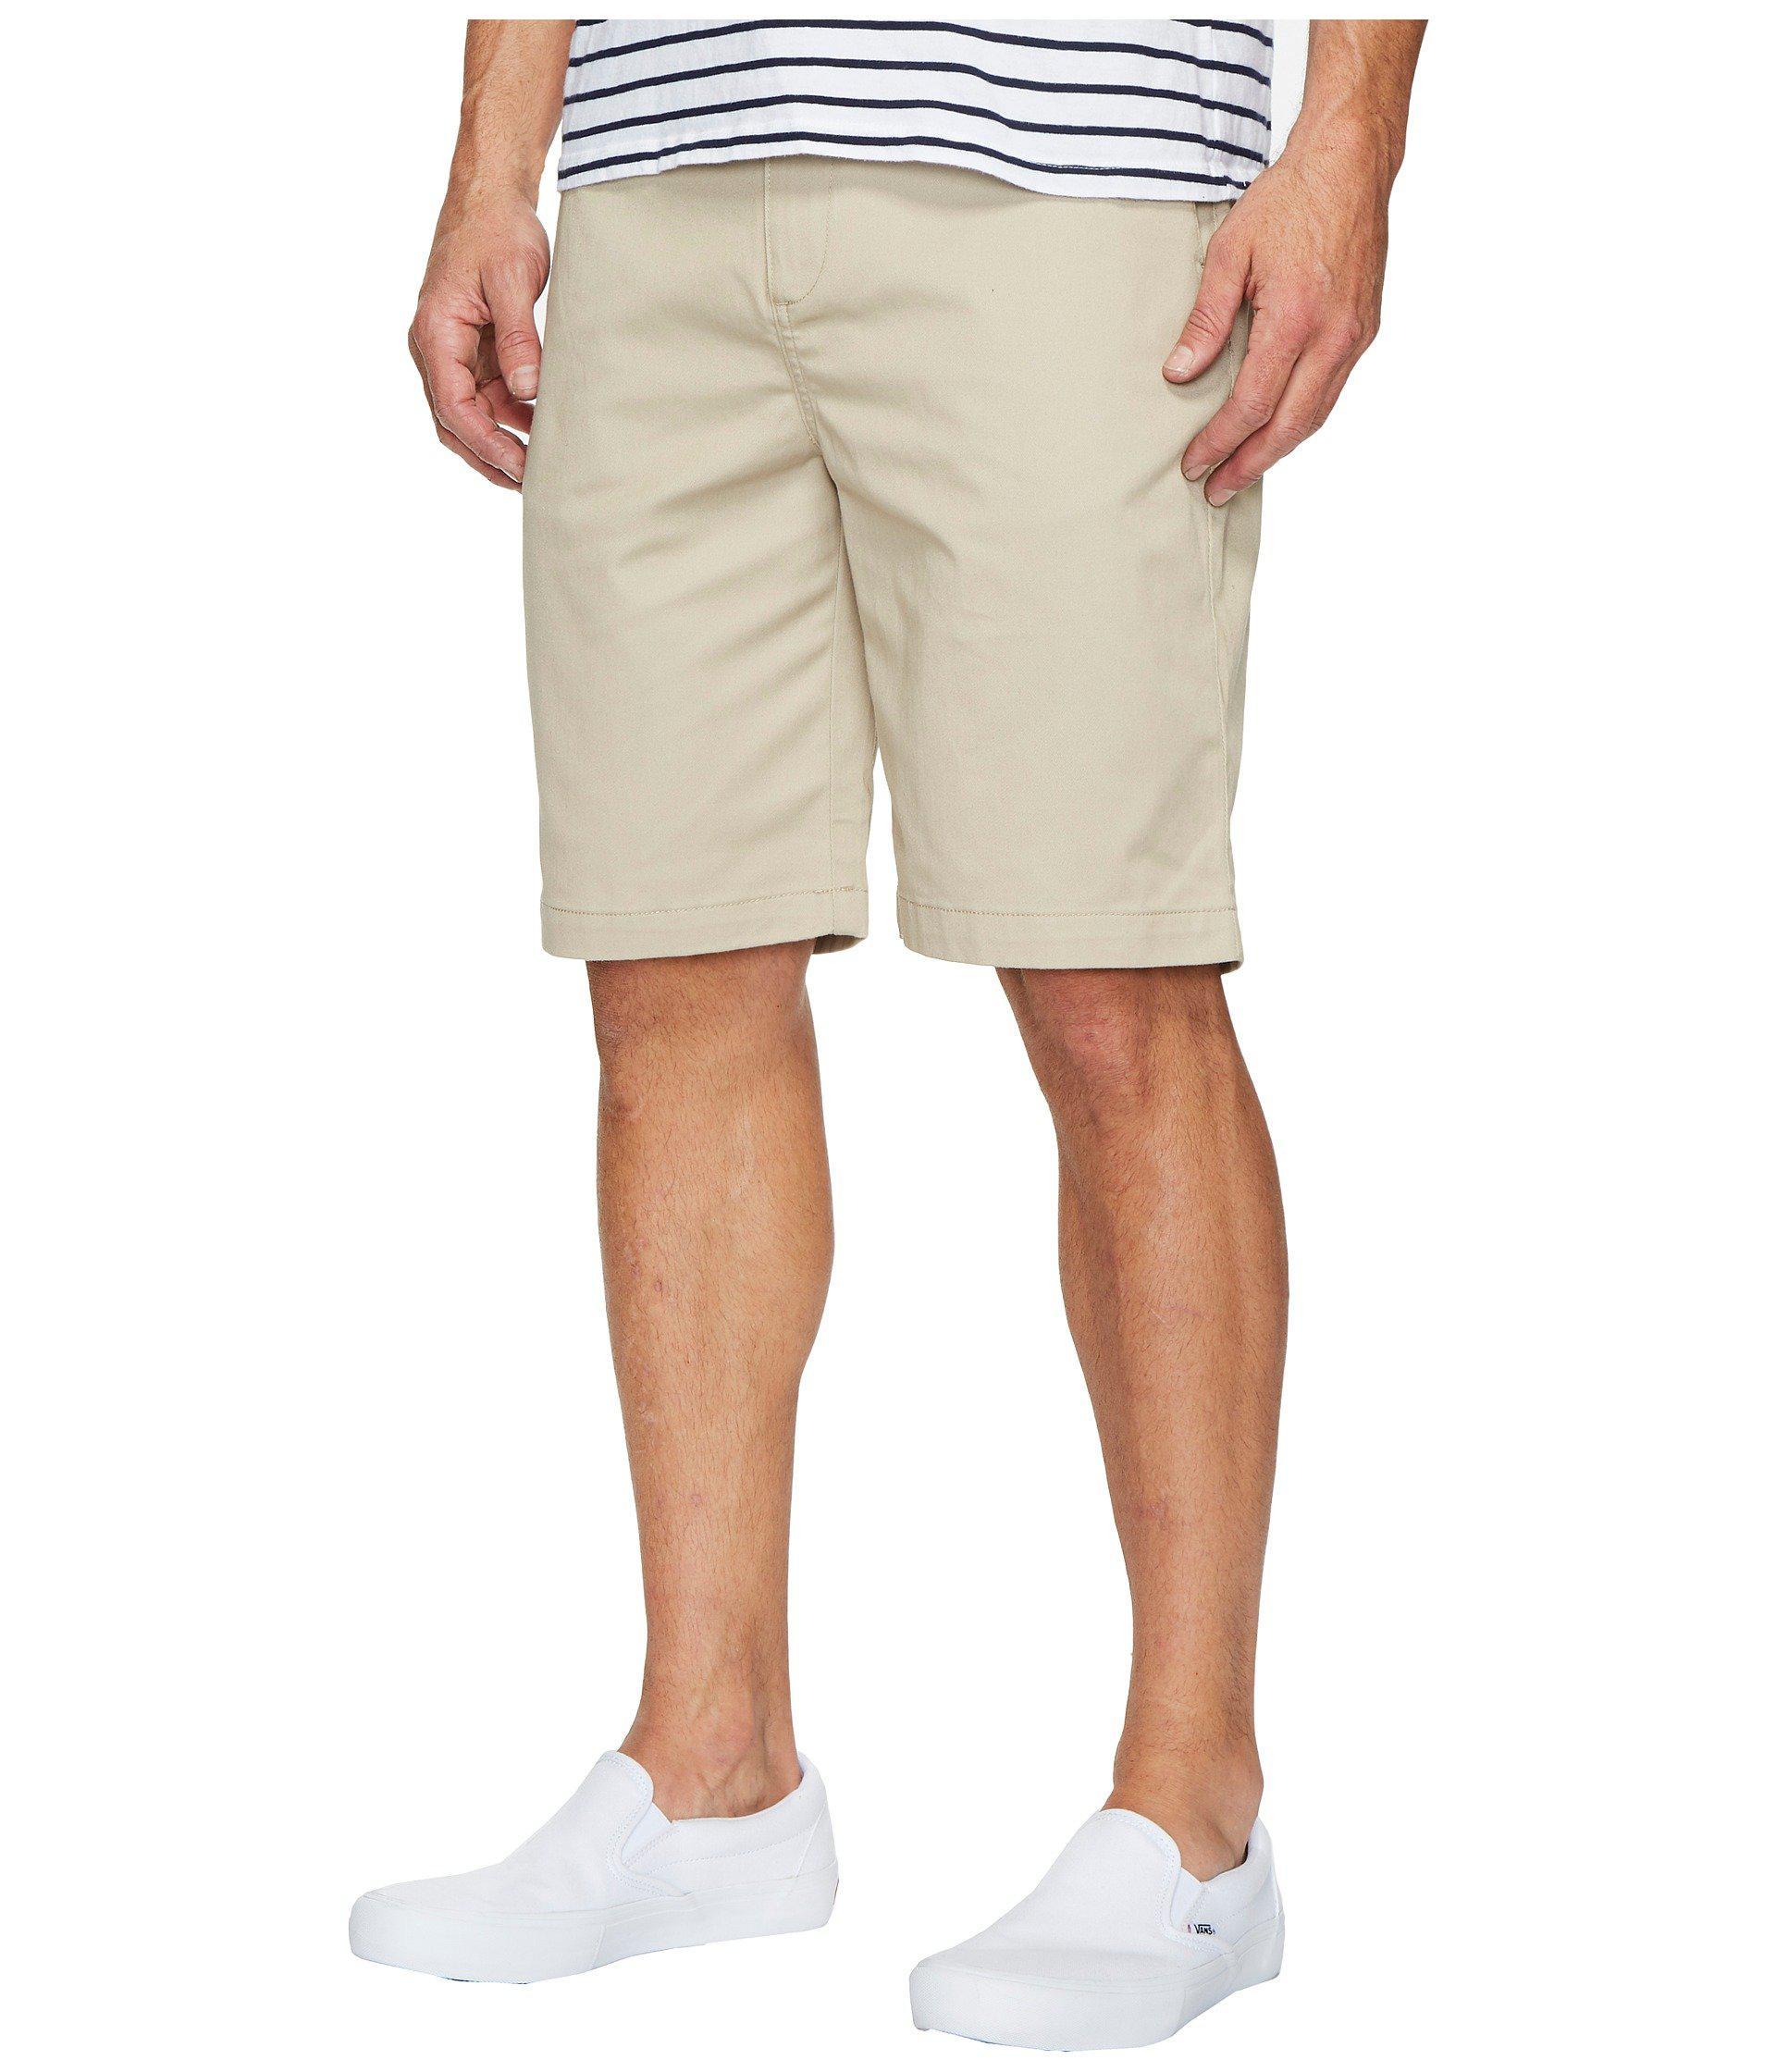 9dcdd33edc Billabong Carter Stretch Shorts (navy) Men's Shorts in Natural for ...